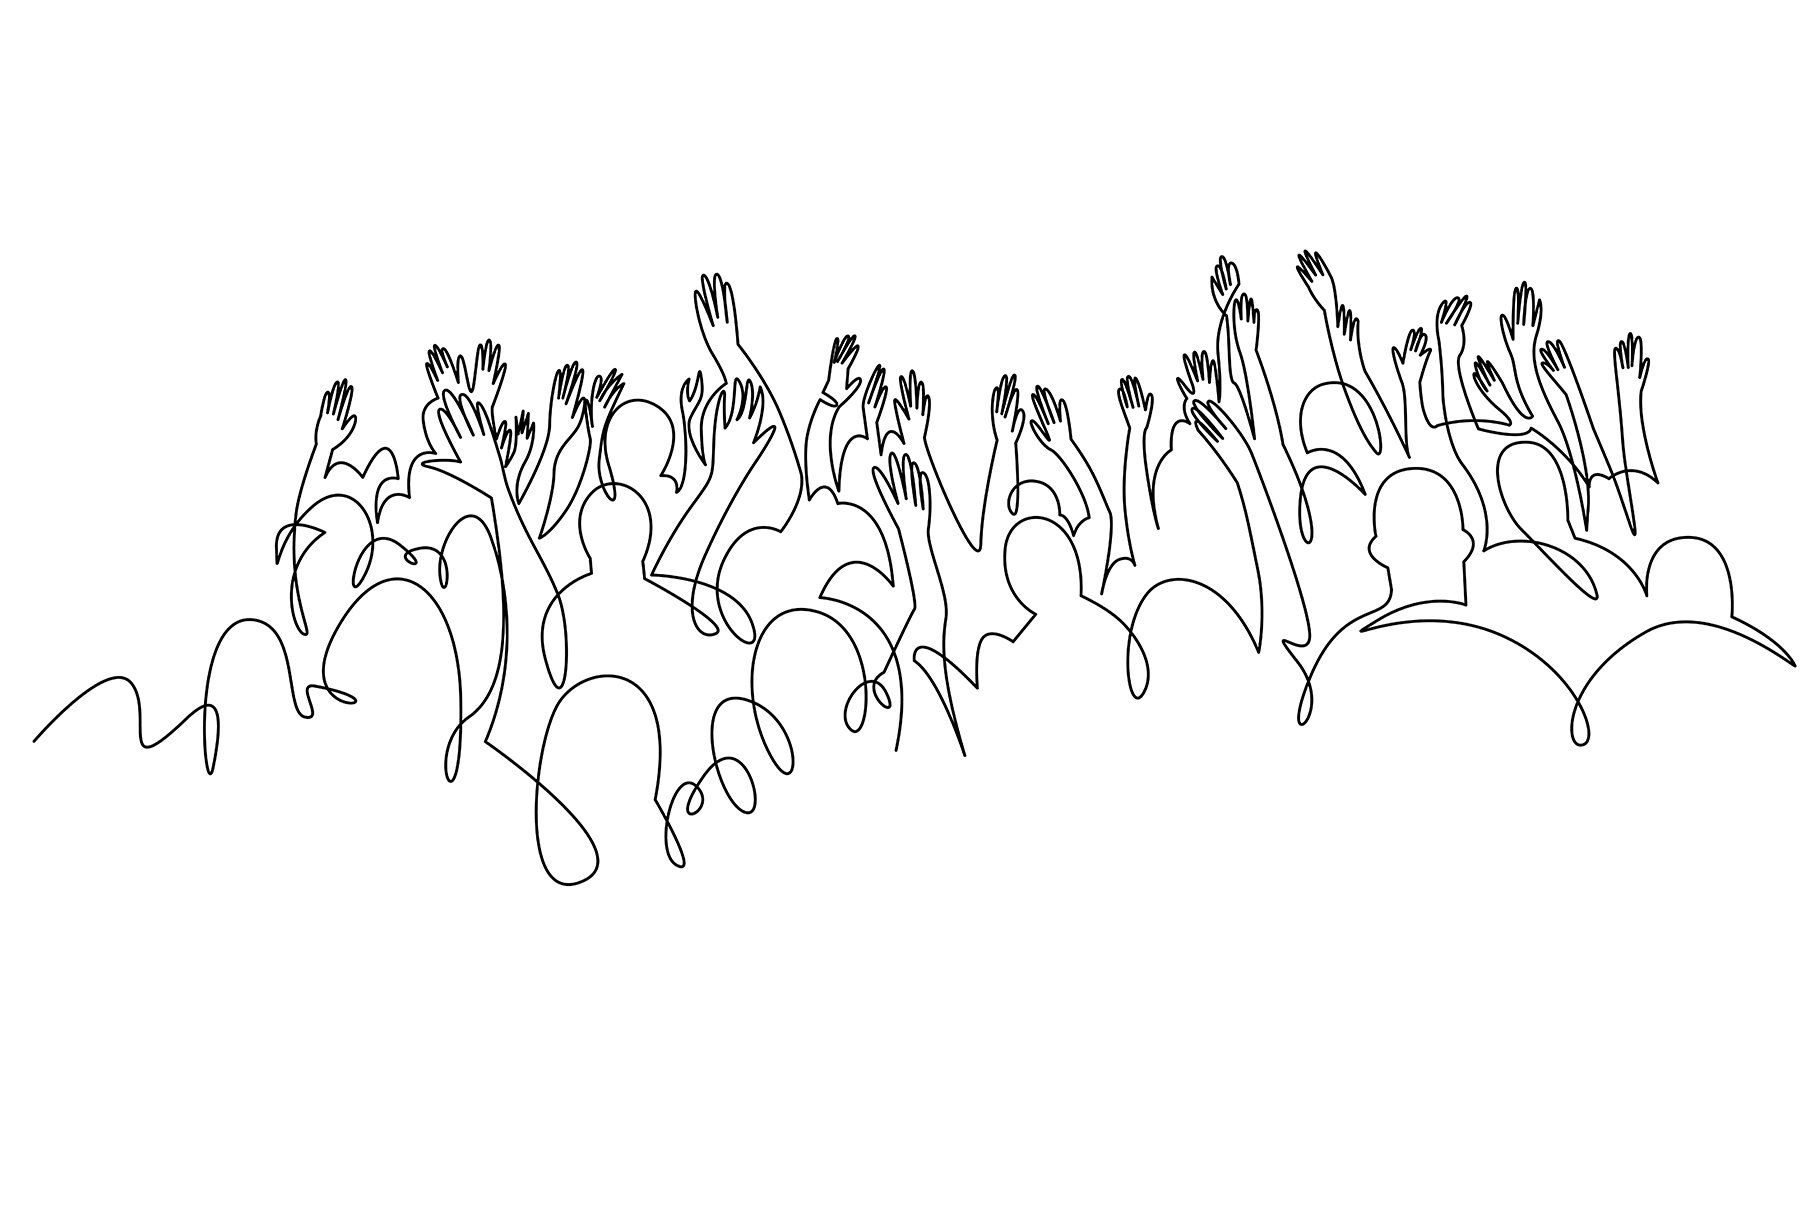 Cheerful Crowd Cheering Illustration Aff Line